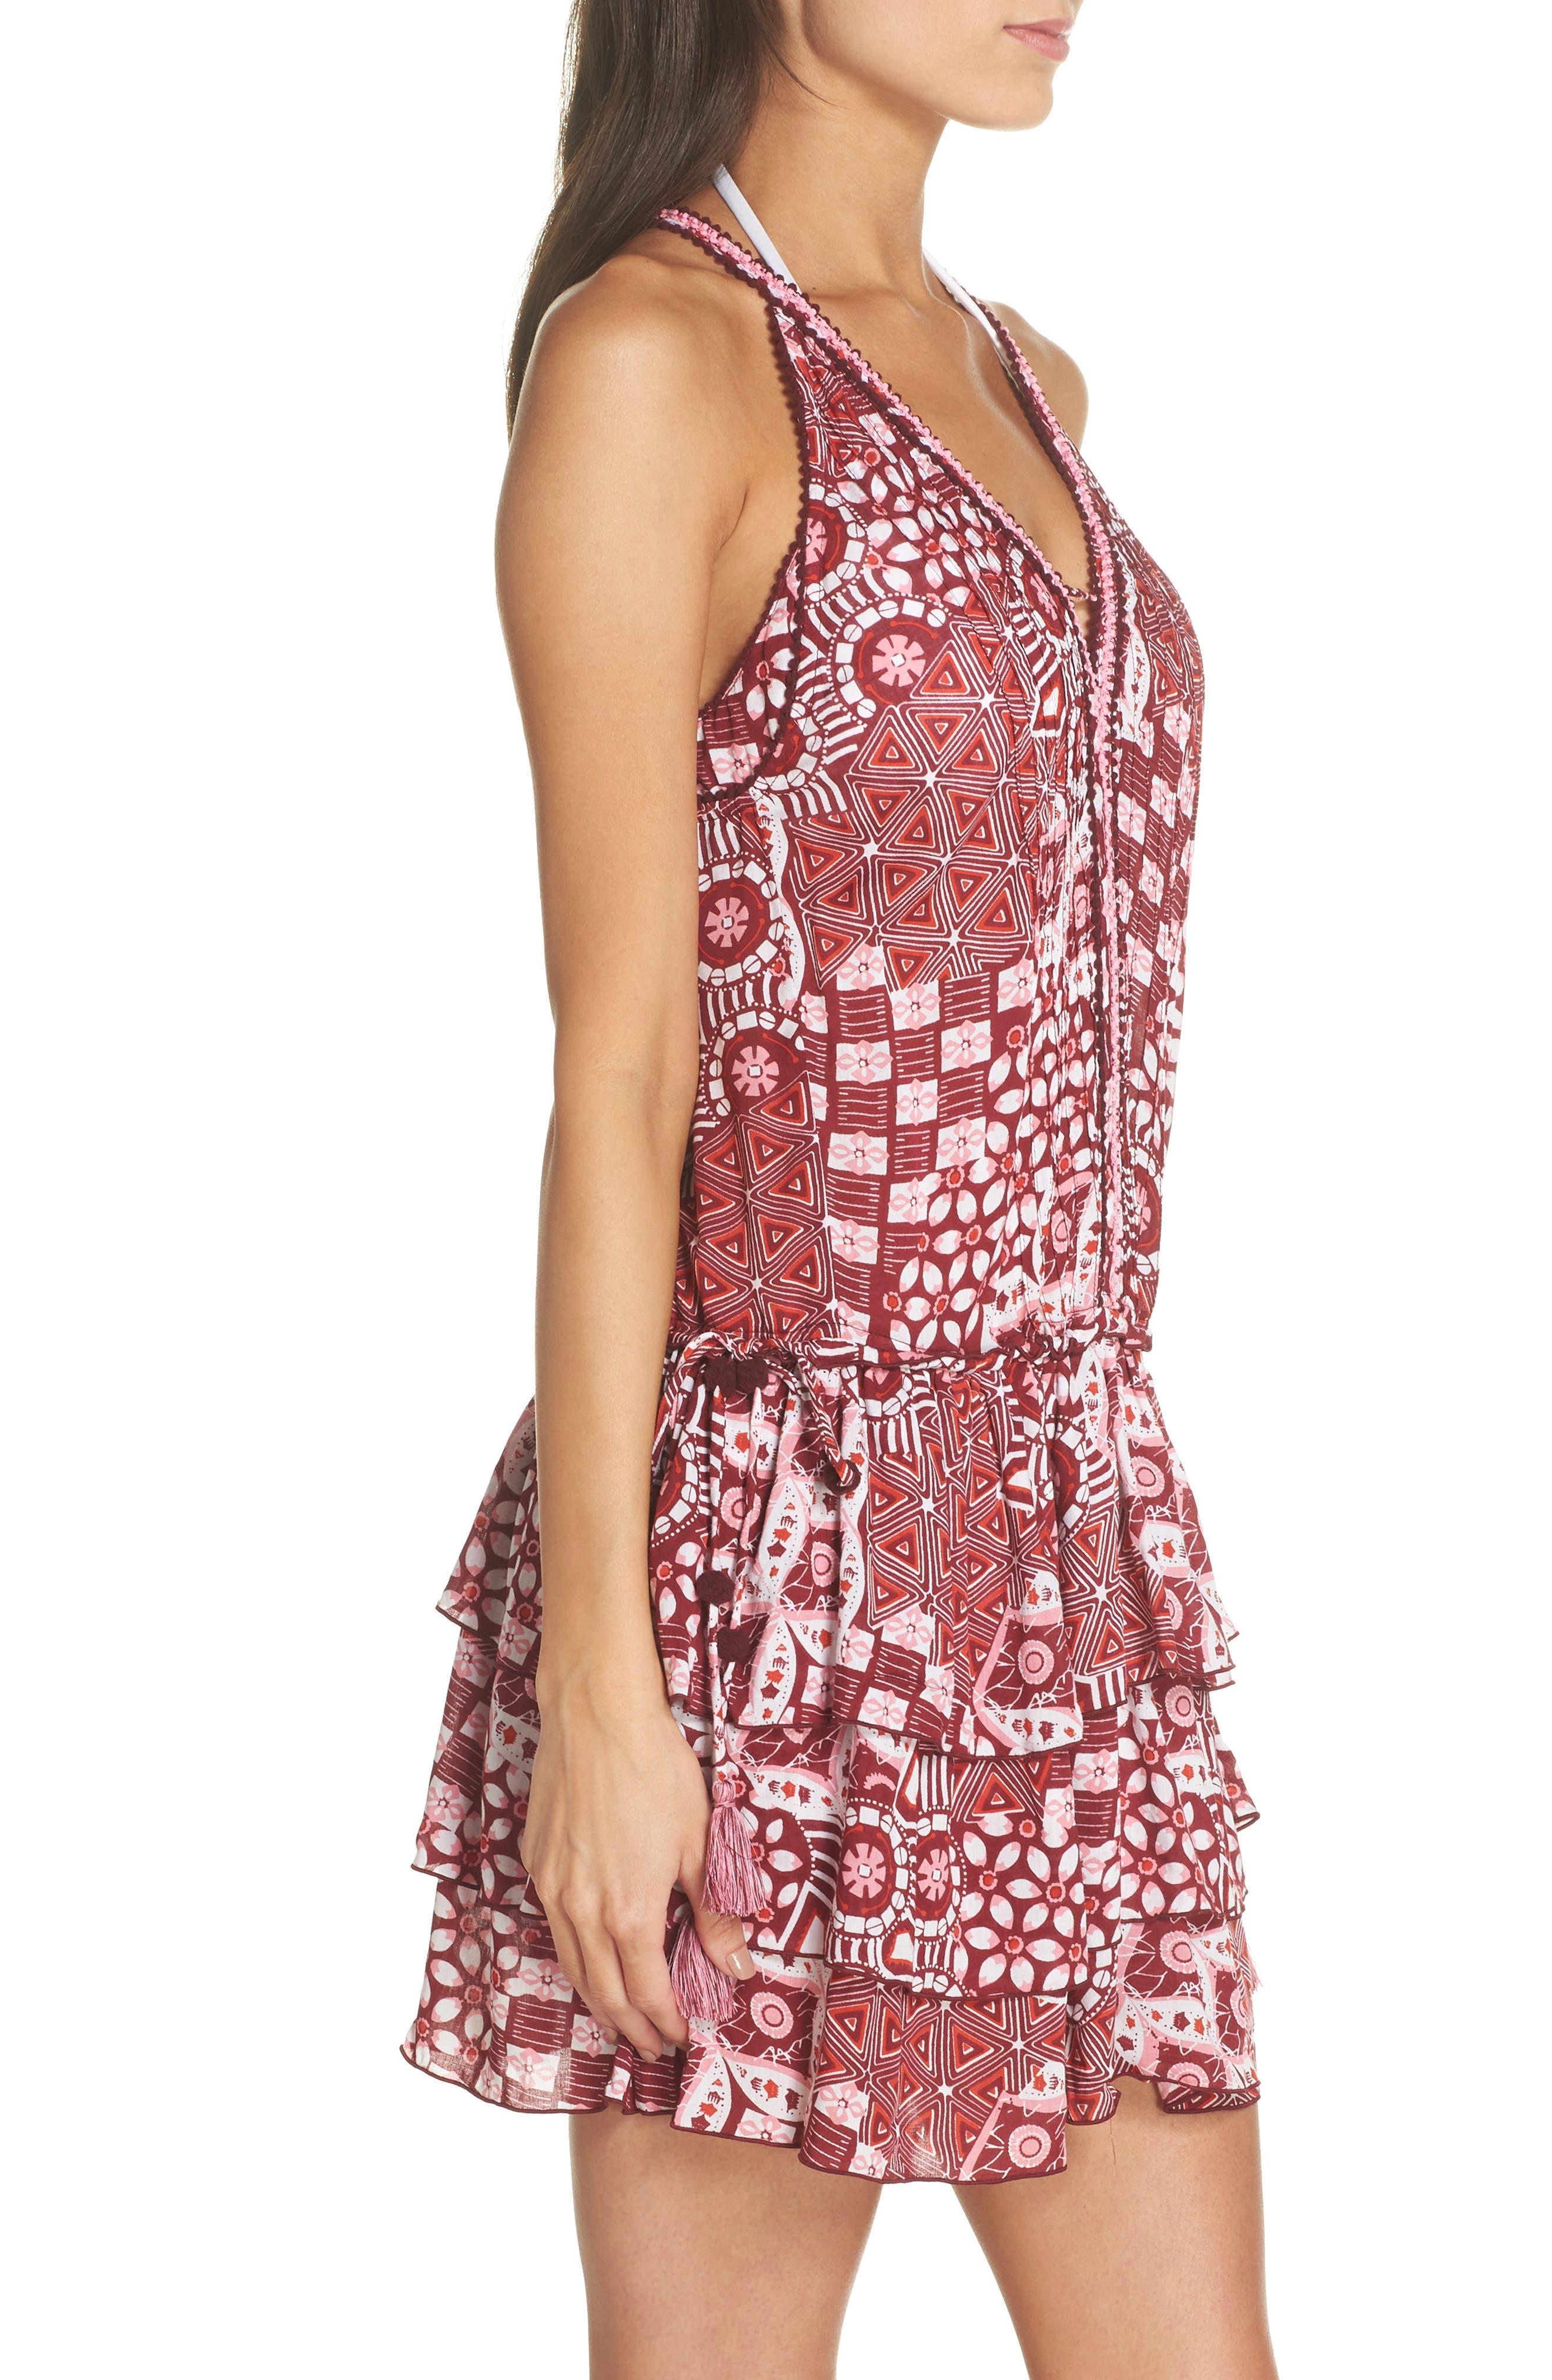 Poupette St. Barth Bety Cover-Up Minidress,                             Alternate thumbnail 3, color,                             Pink Mali